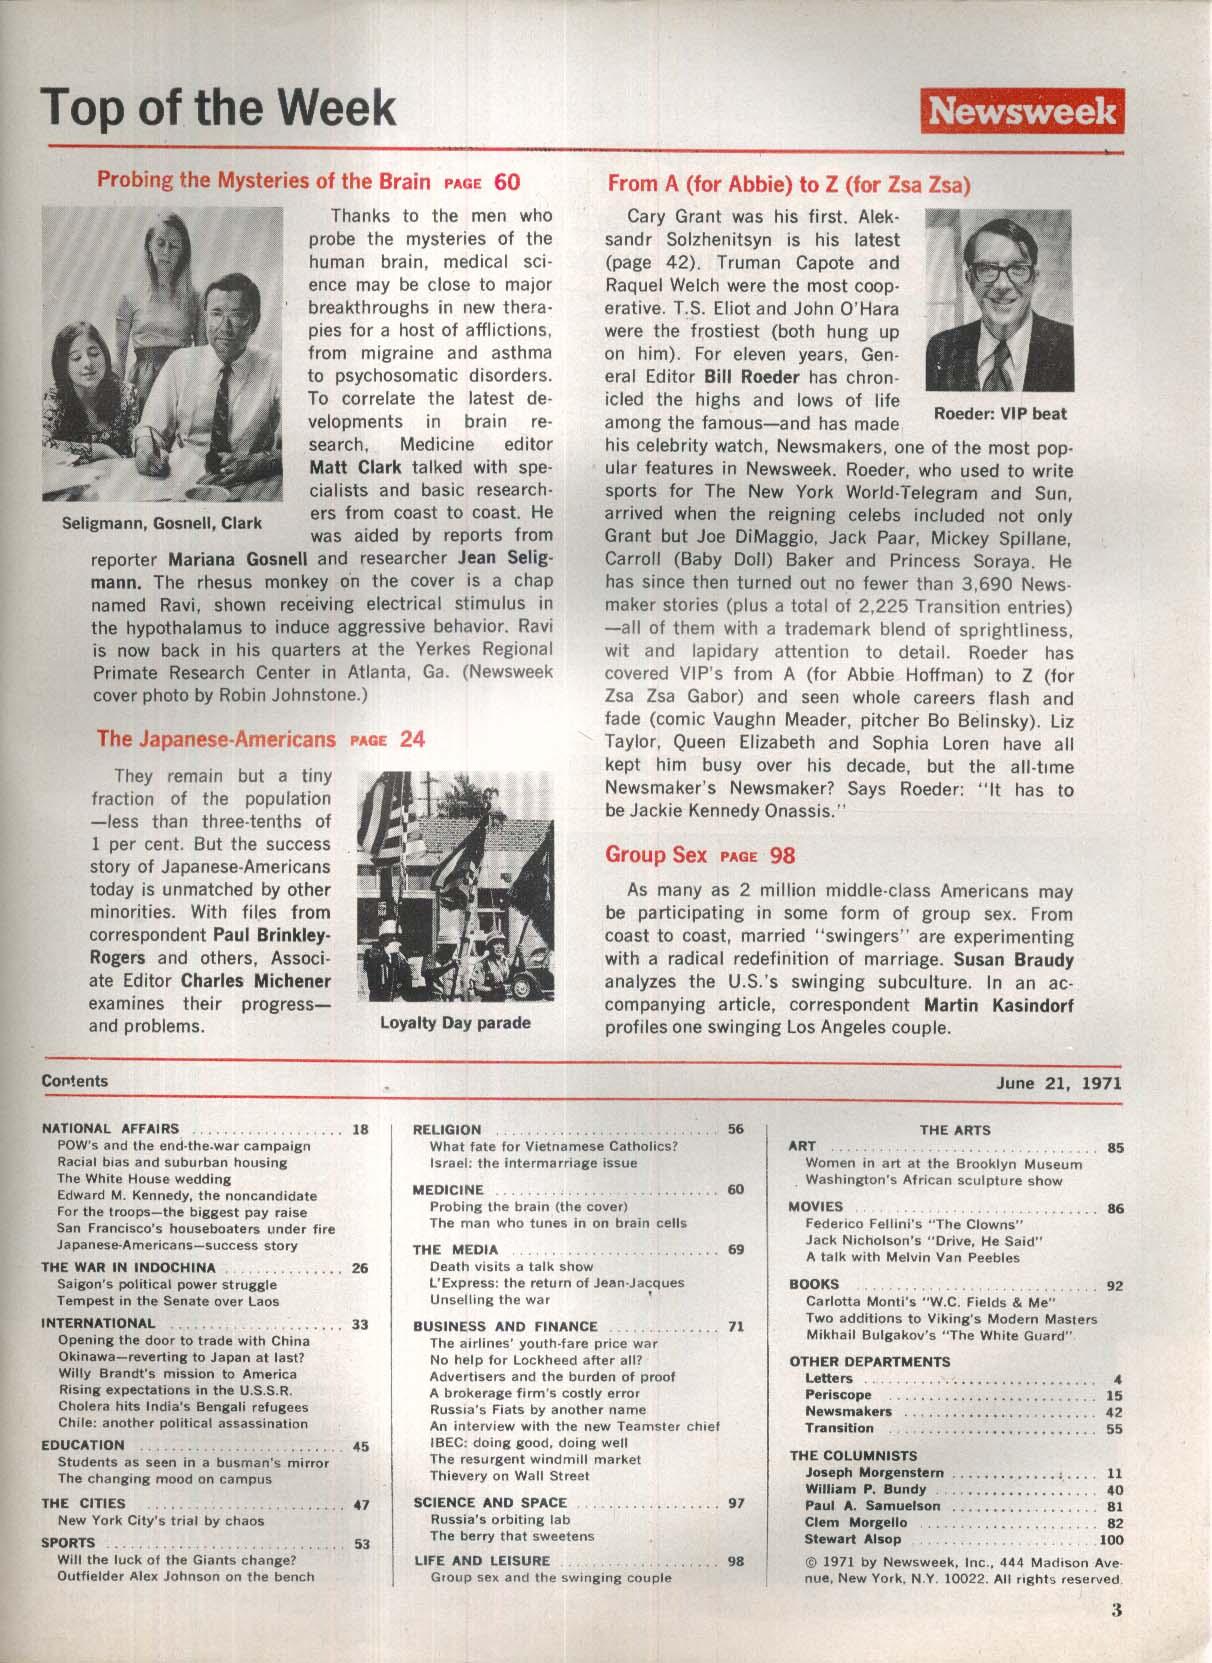 NEWSWEEK Brain Research Edward Kennedy Vietnam POW 6/21 1971